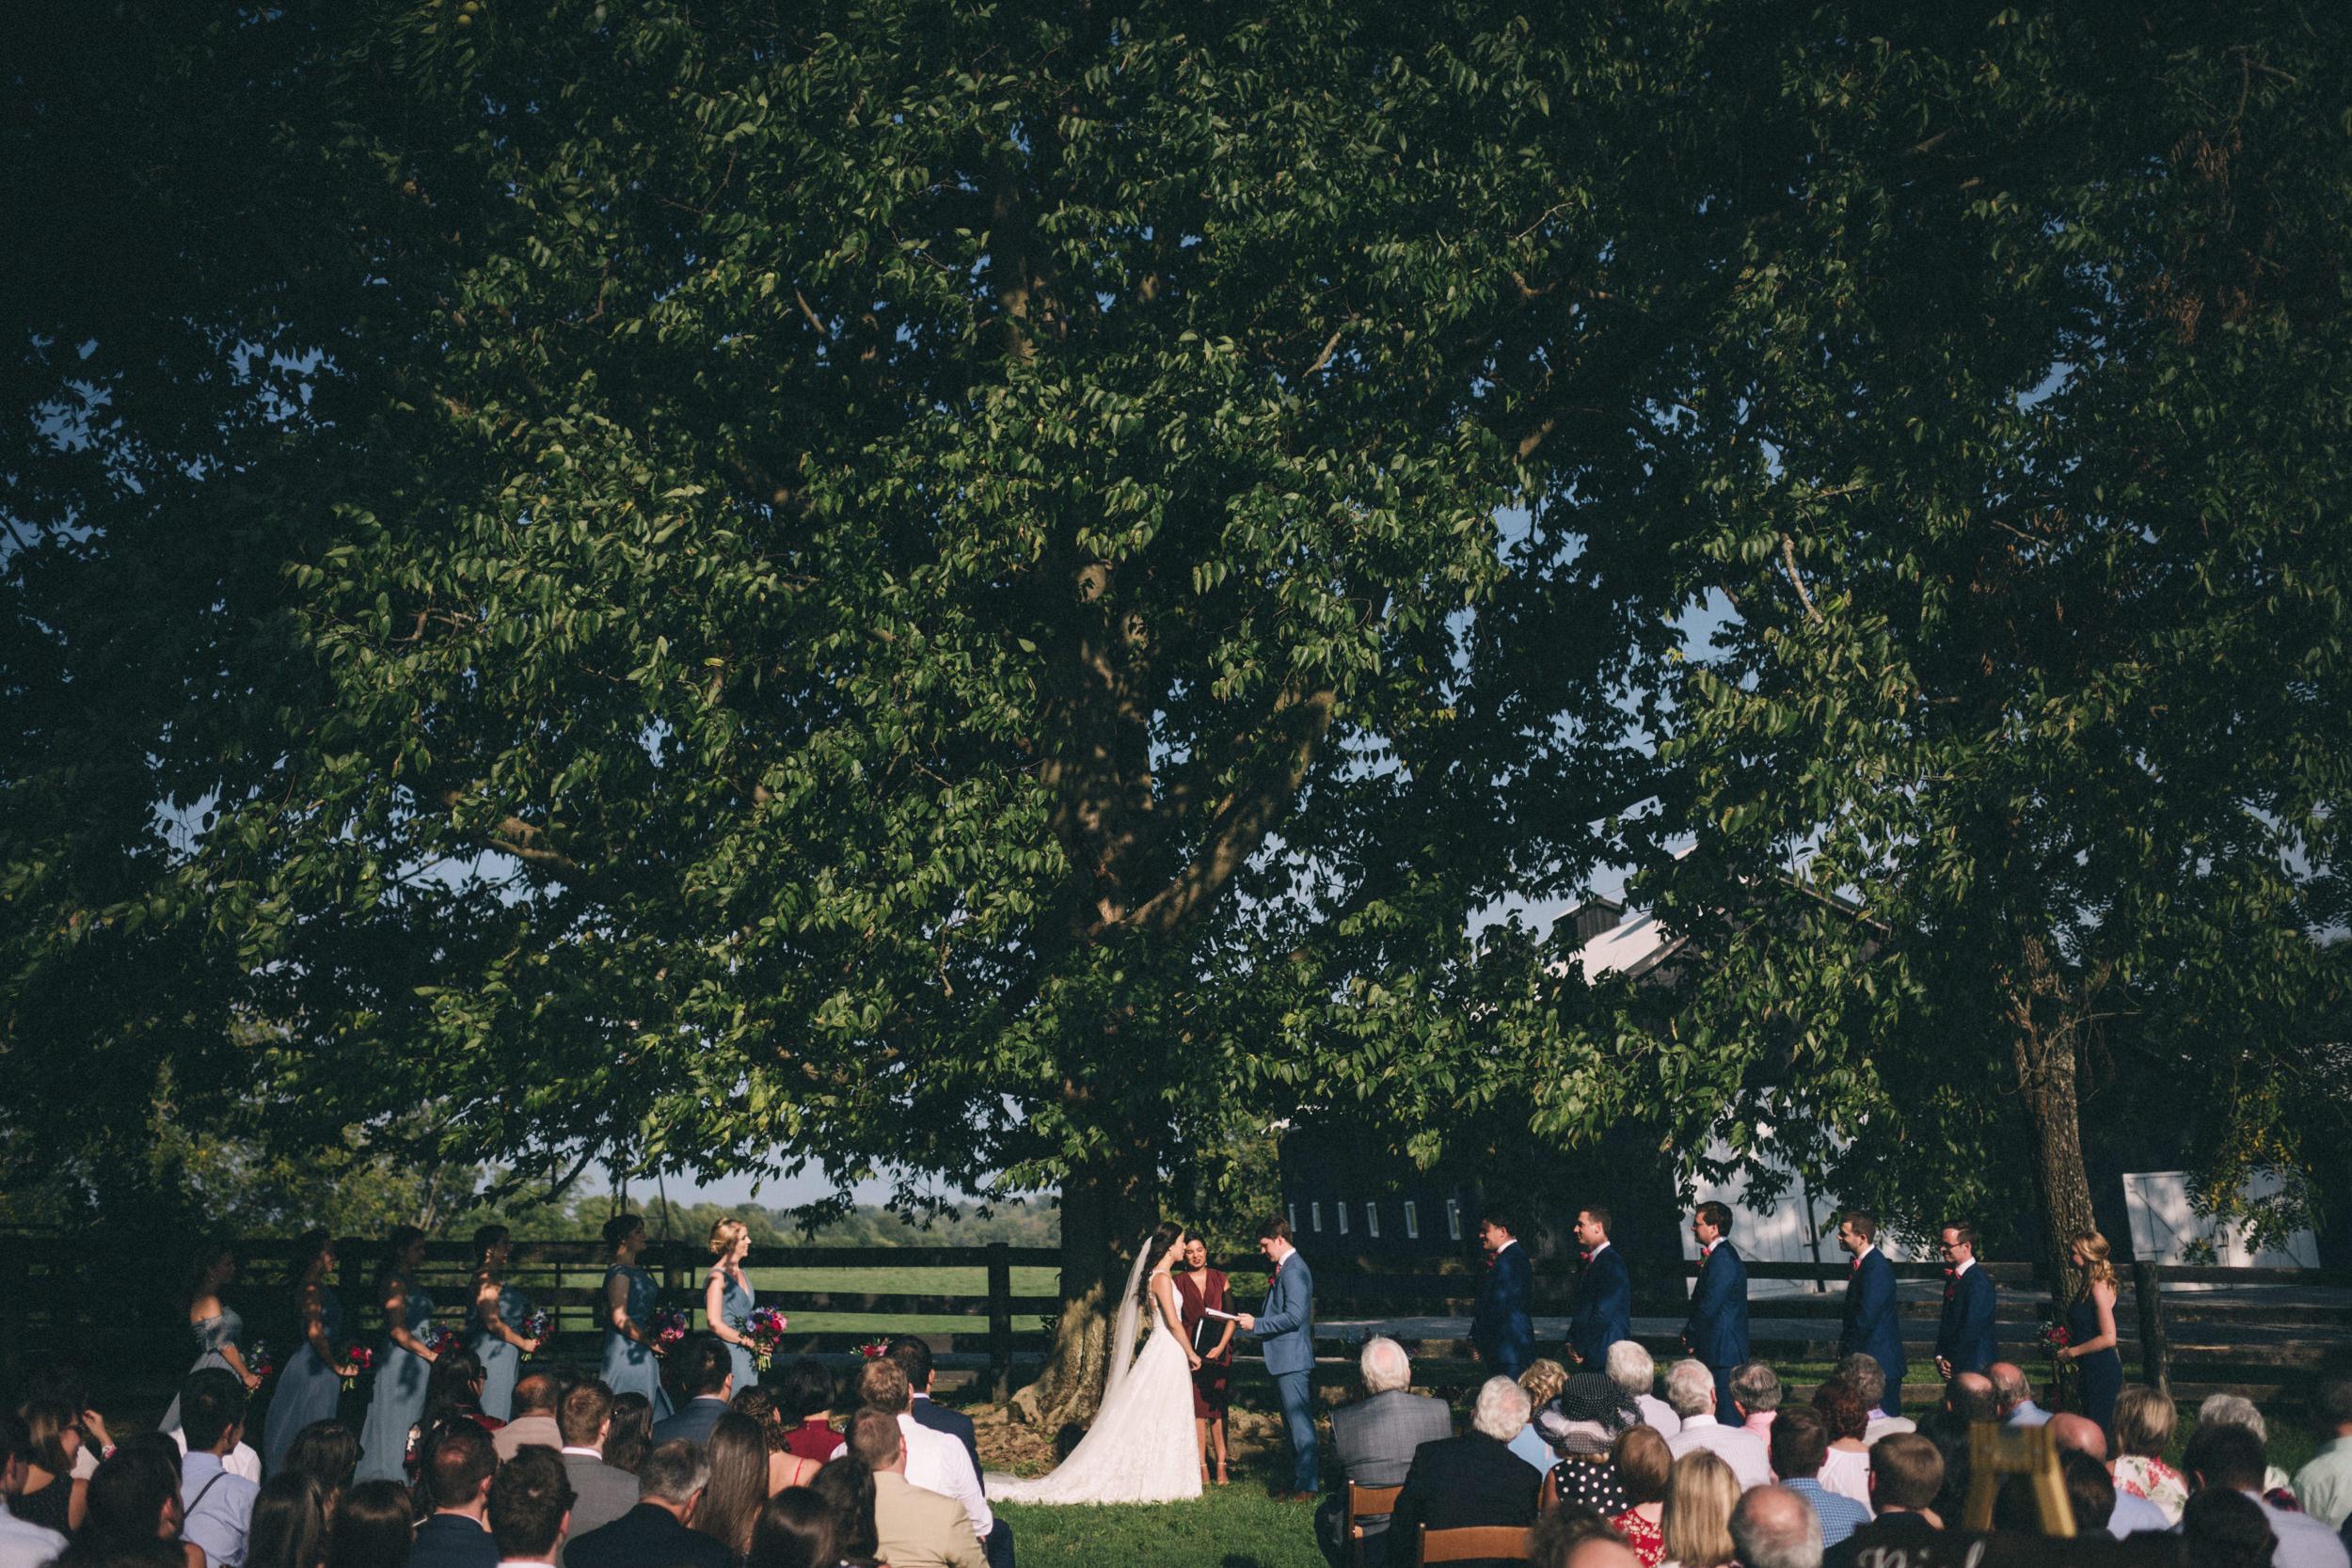 Louisville-Kentucky-Wedding-and-Elopement-Photographer-Sarah-Katherine-Davis-Photography-Summer-Jewel-Toned-Wedding-Chineese-Tea-Ceremony-Warrenwood-Manor-Danville-578.jpg